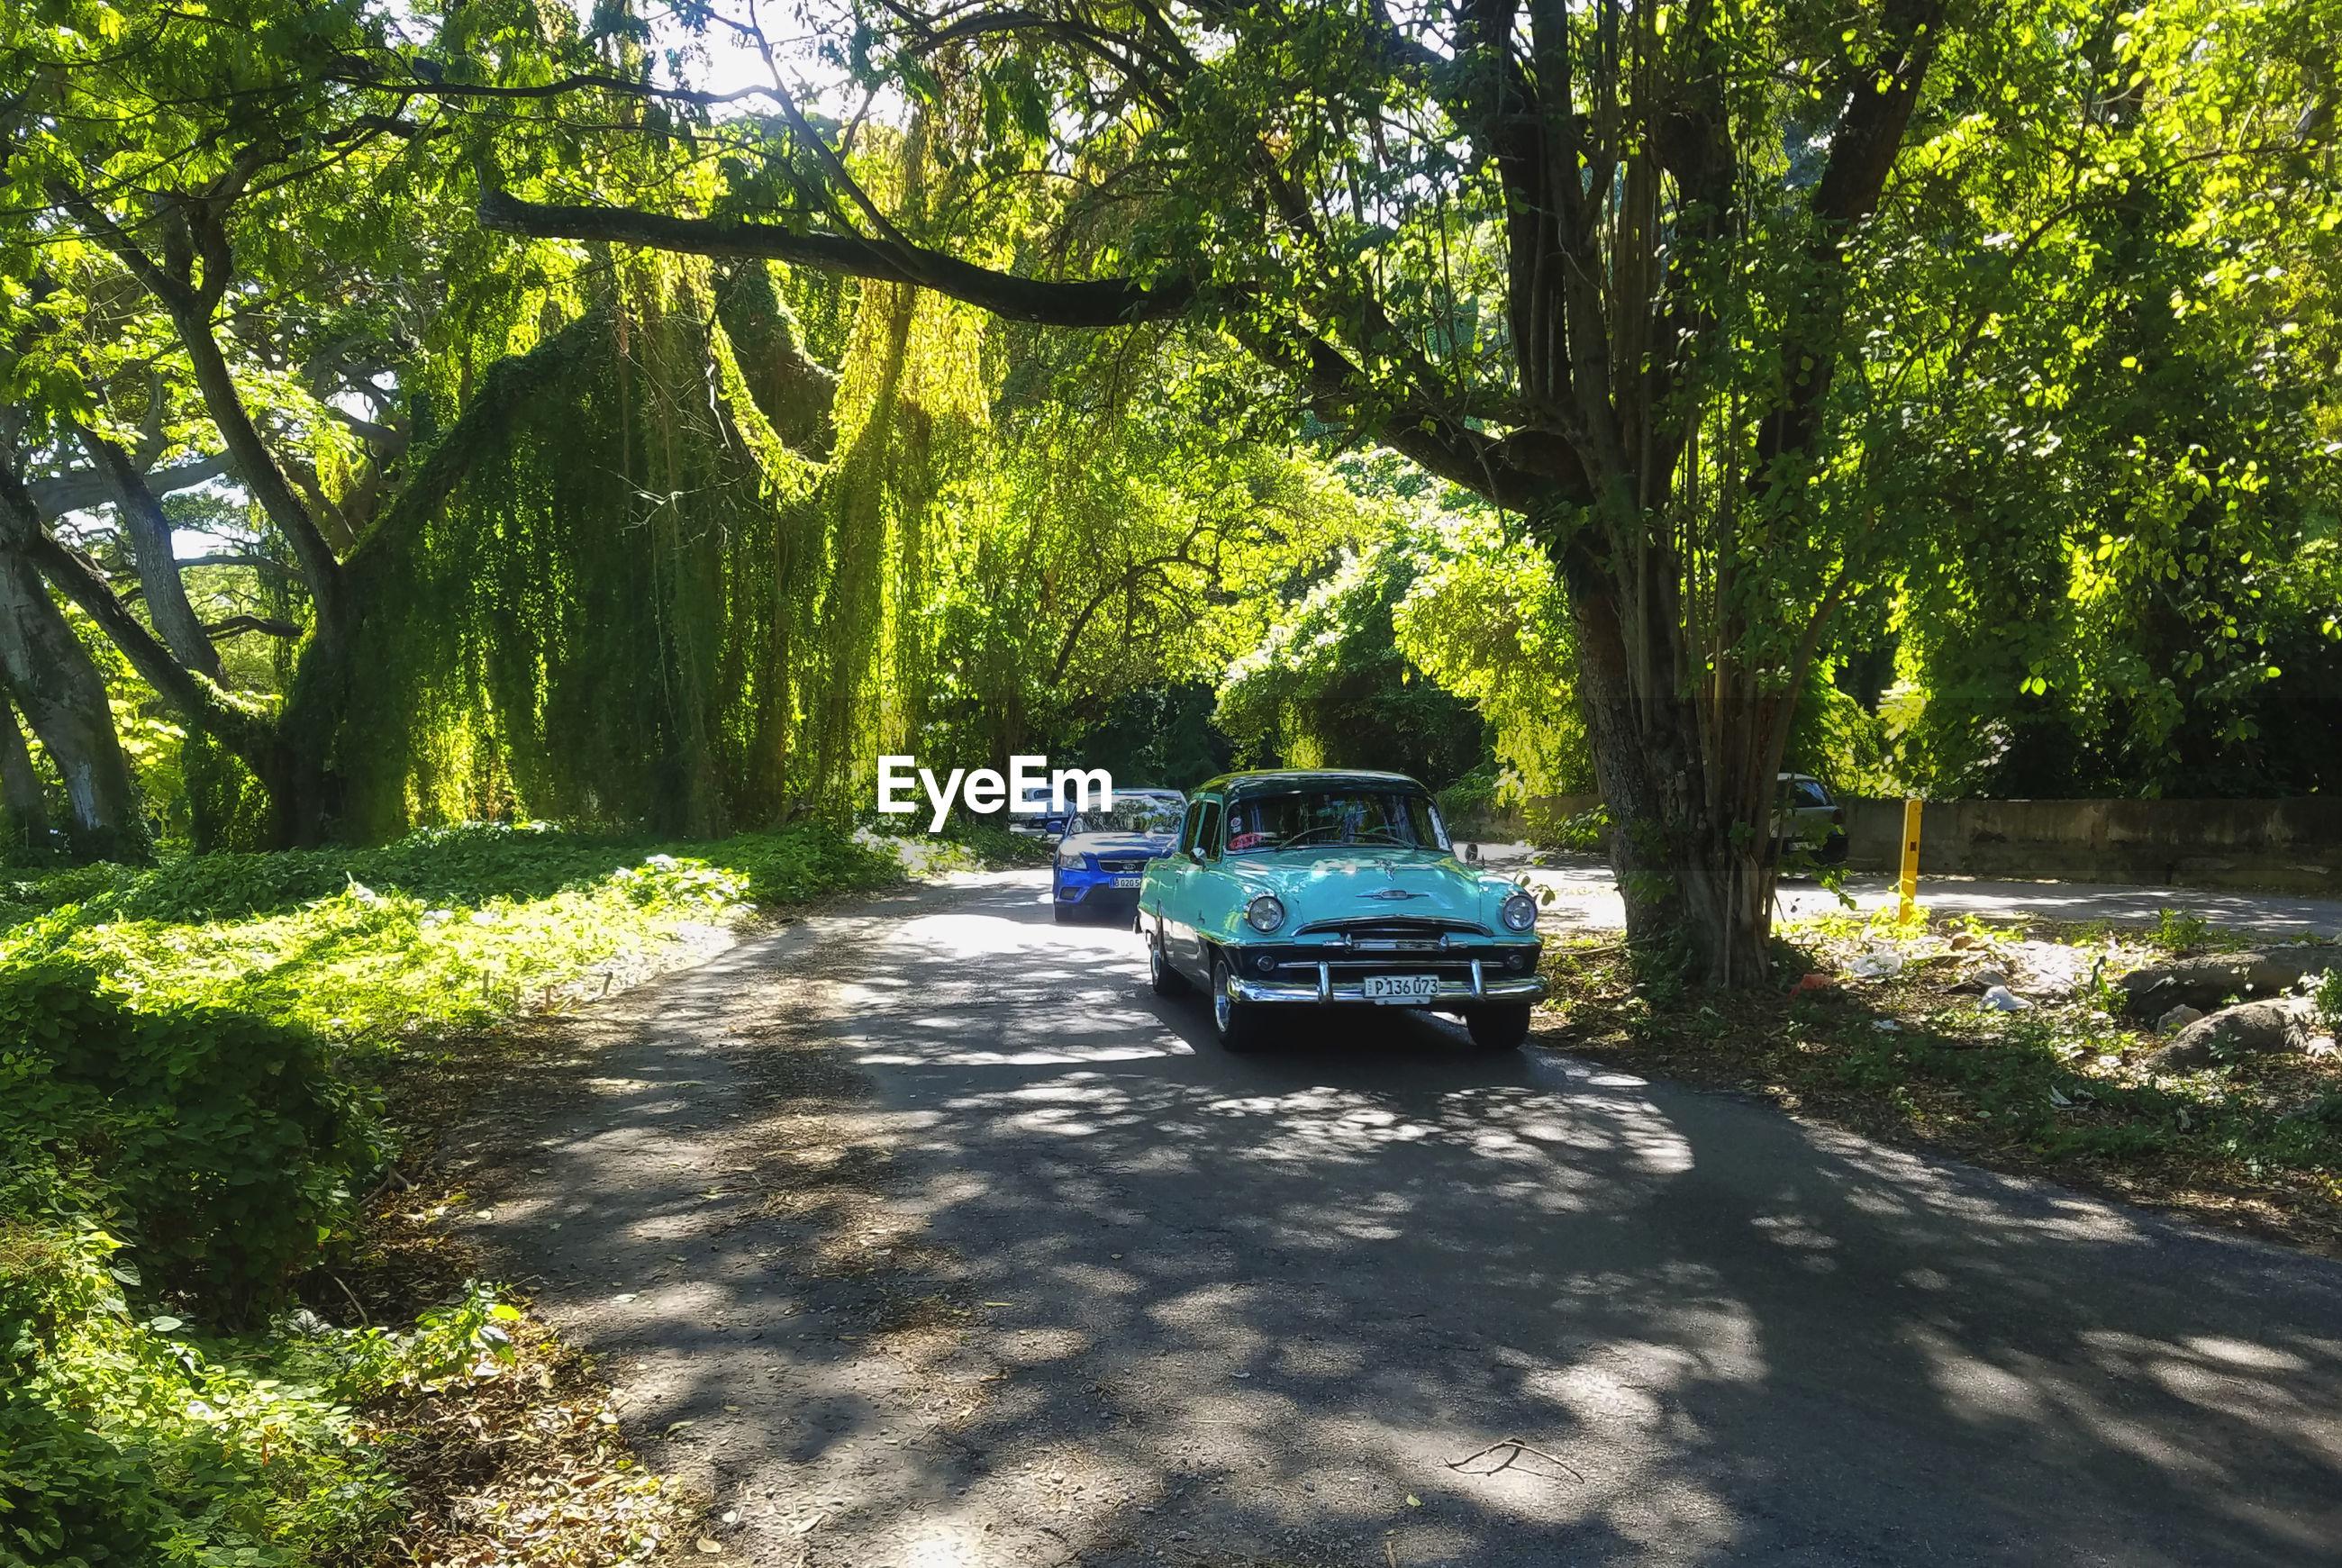 Classic car on road along trees